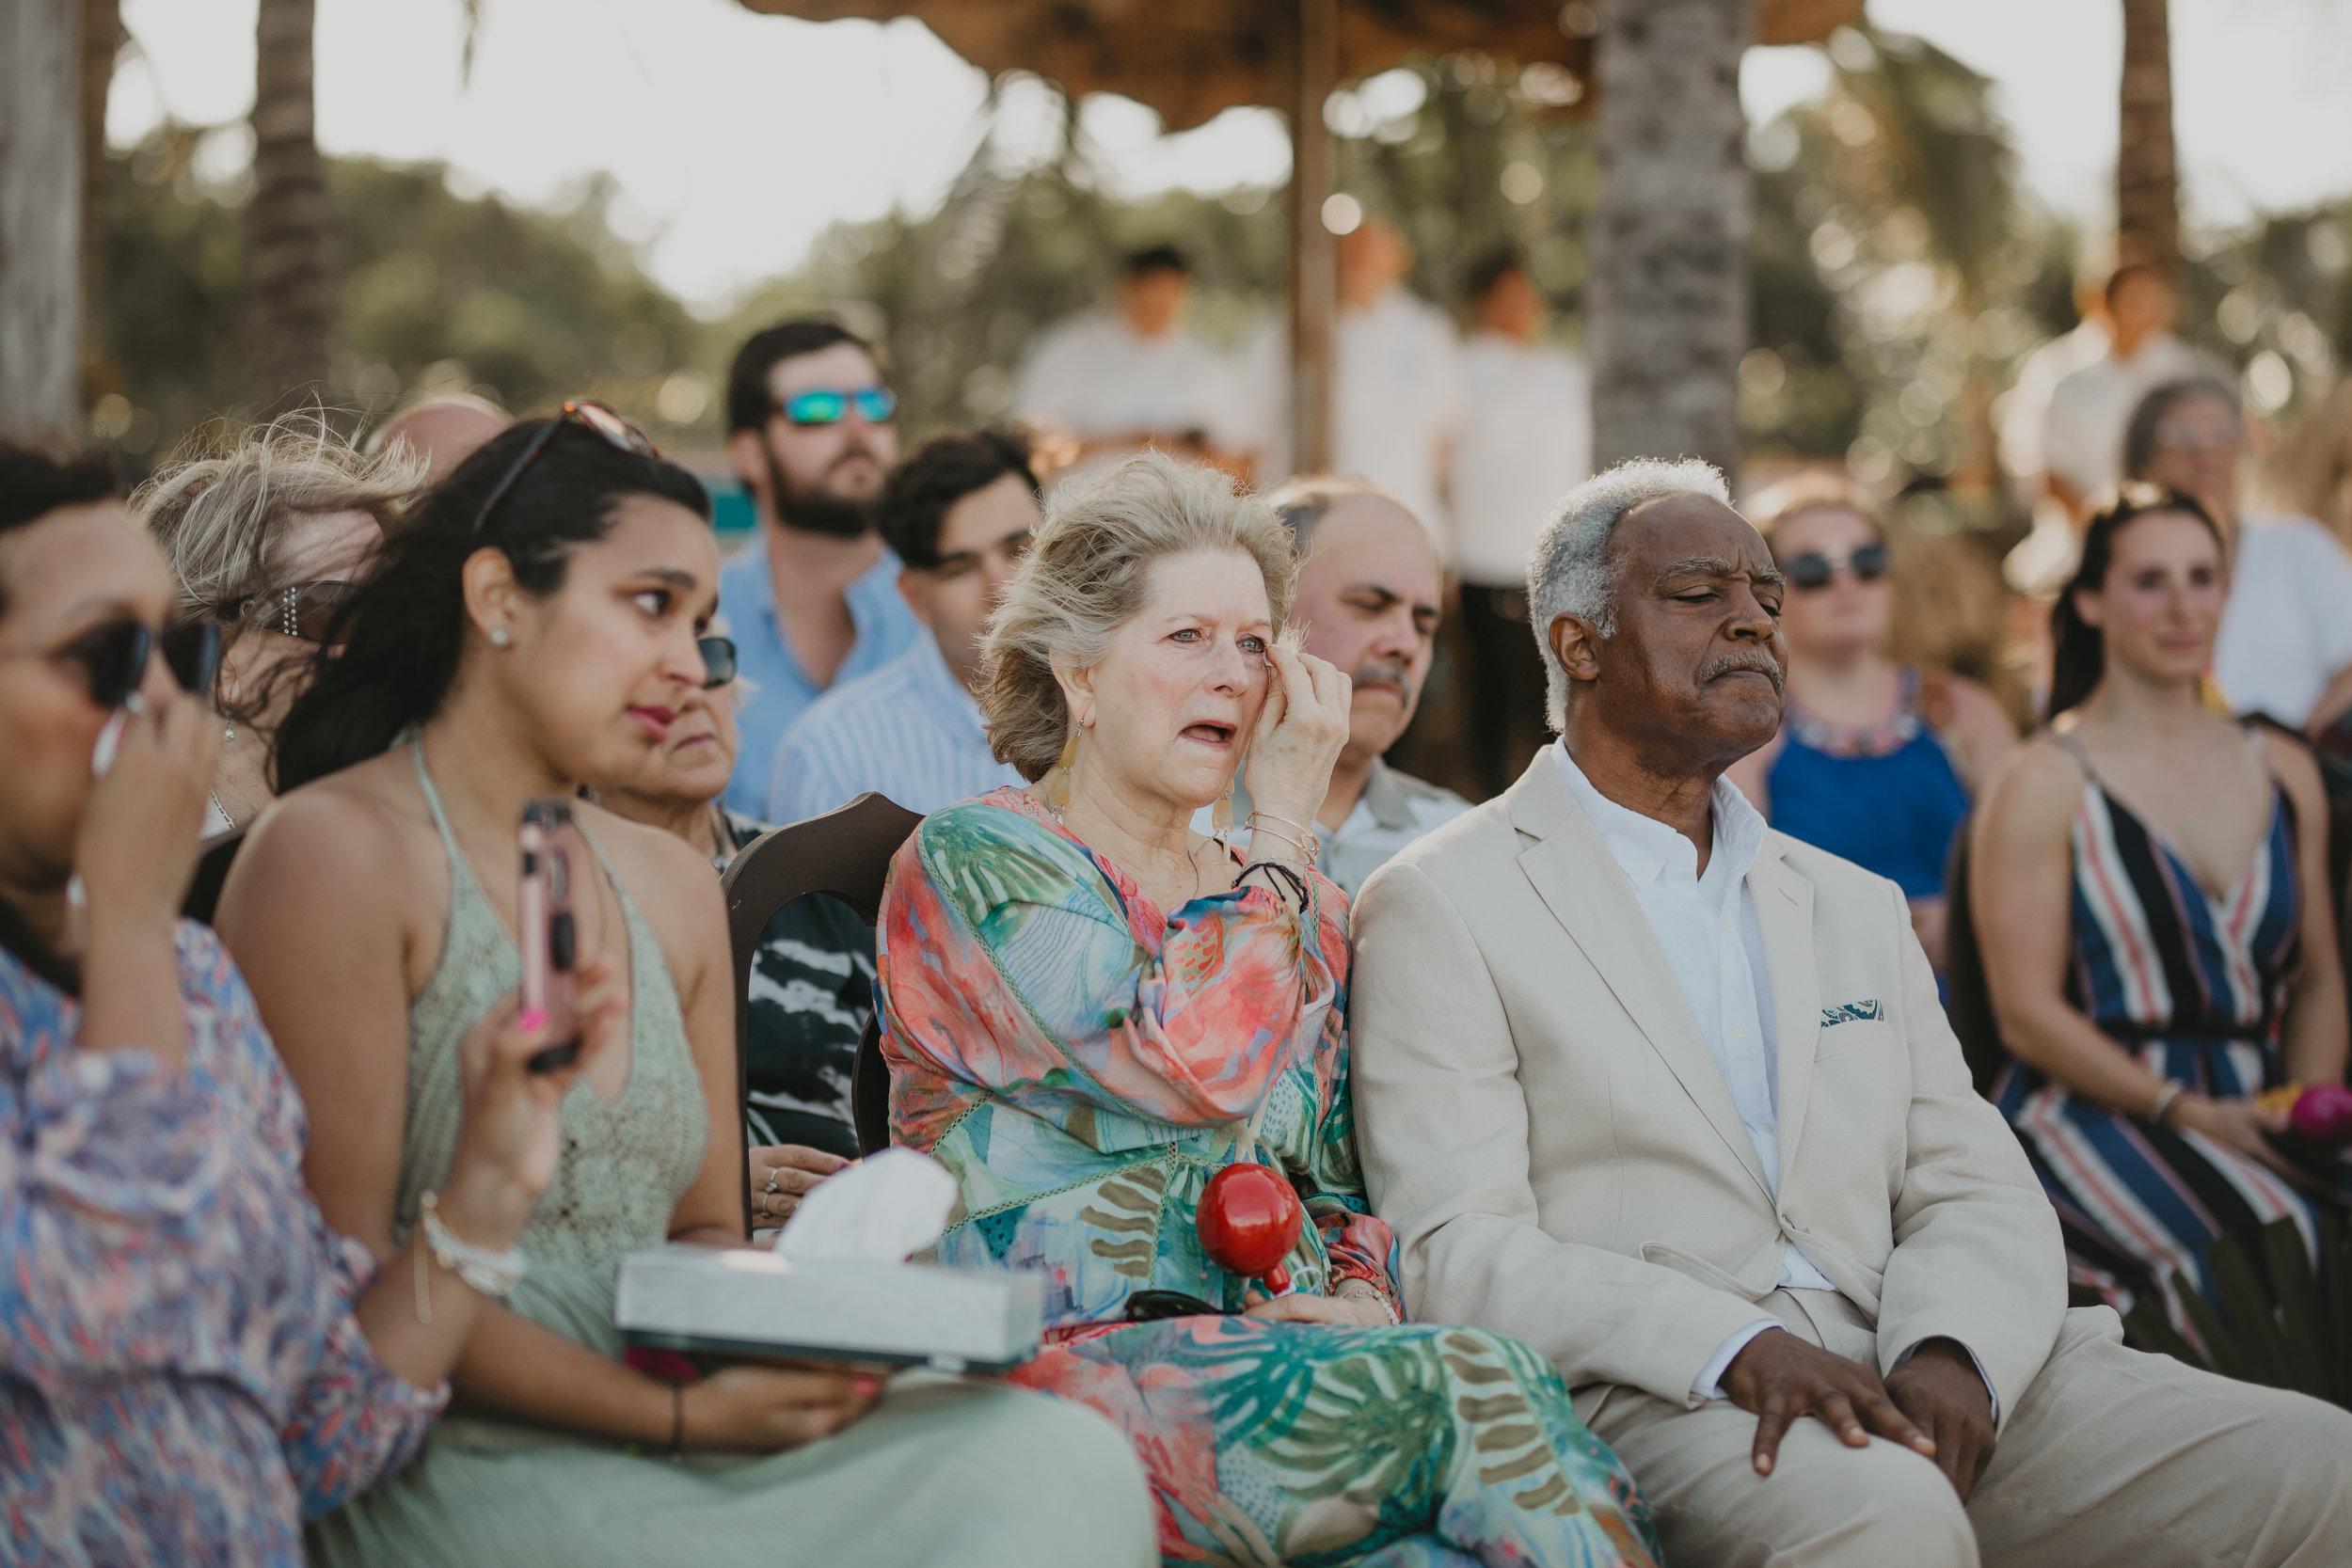 Nicole-Daacke-Photography-beachfront-akumal-destionation-wedding-tulum-mexico-elopement-photographer-destination-wedding-inspiration-sunset-champagne-pop-boho-bride-ocean-tropical-bohemian-tulum-wedding-photos-165.jpg